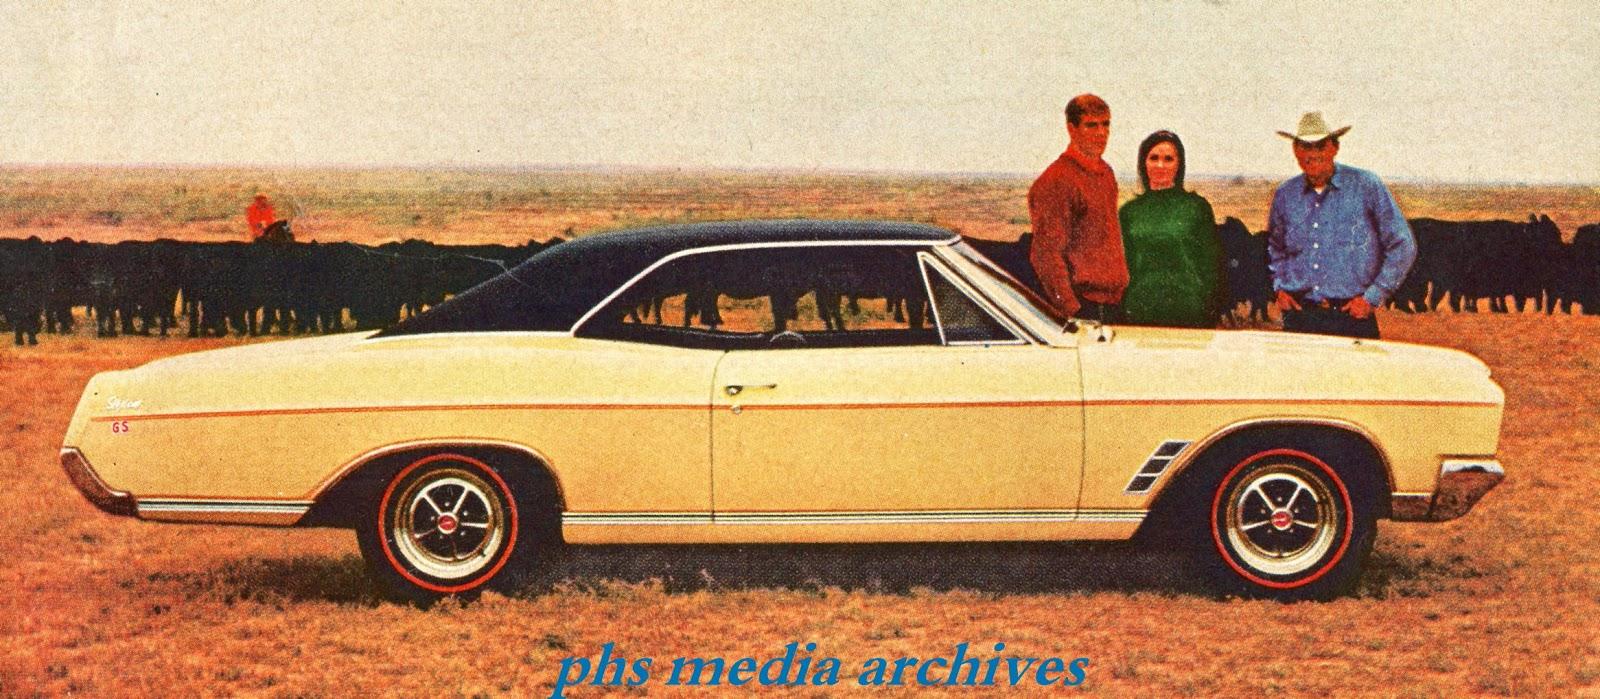 1966 Buick Skylark GS- Inside Dope